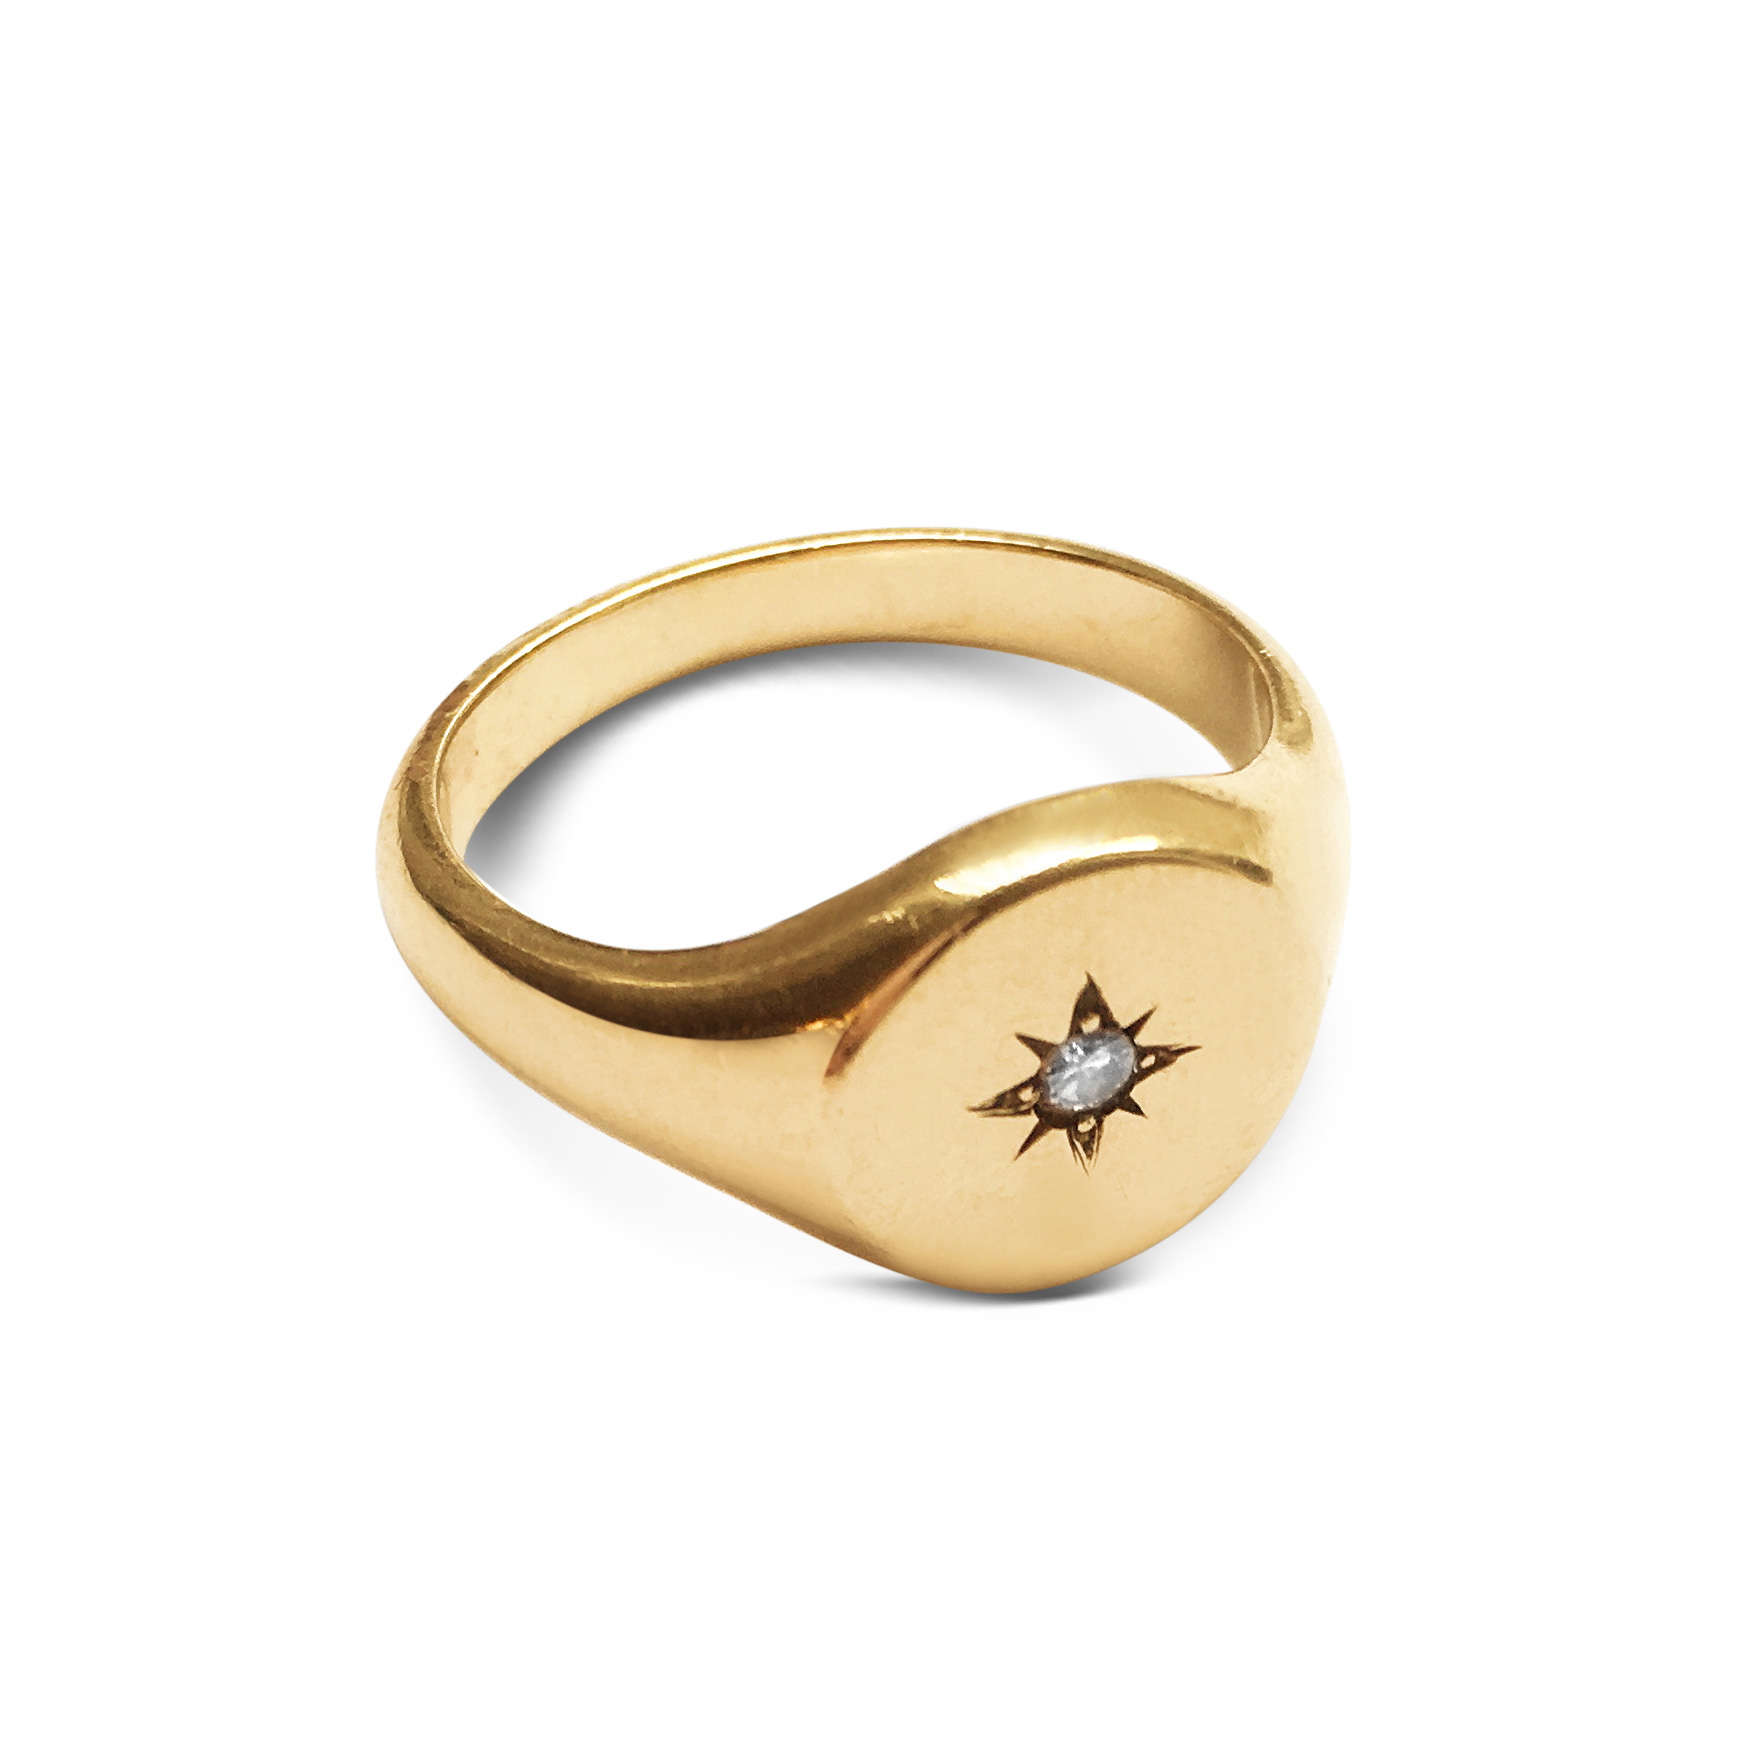 Vintage 9CT Yellow Gold Diamond-Set Star Signet Ring Side